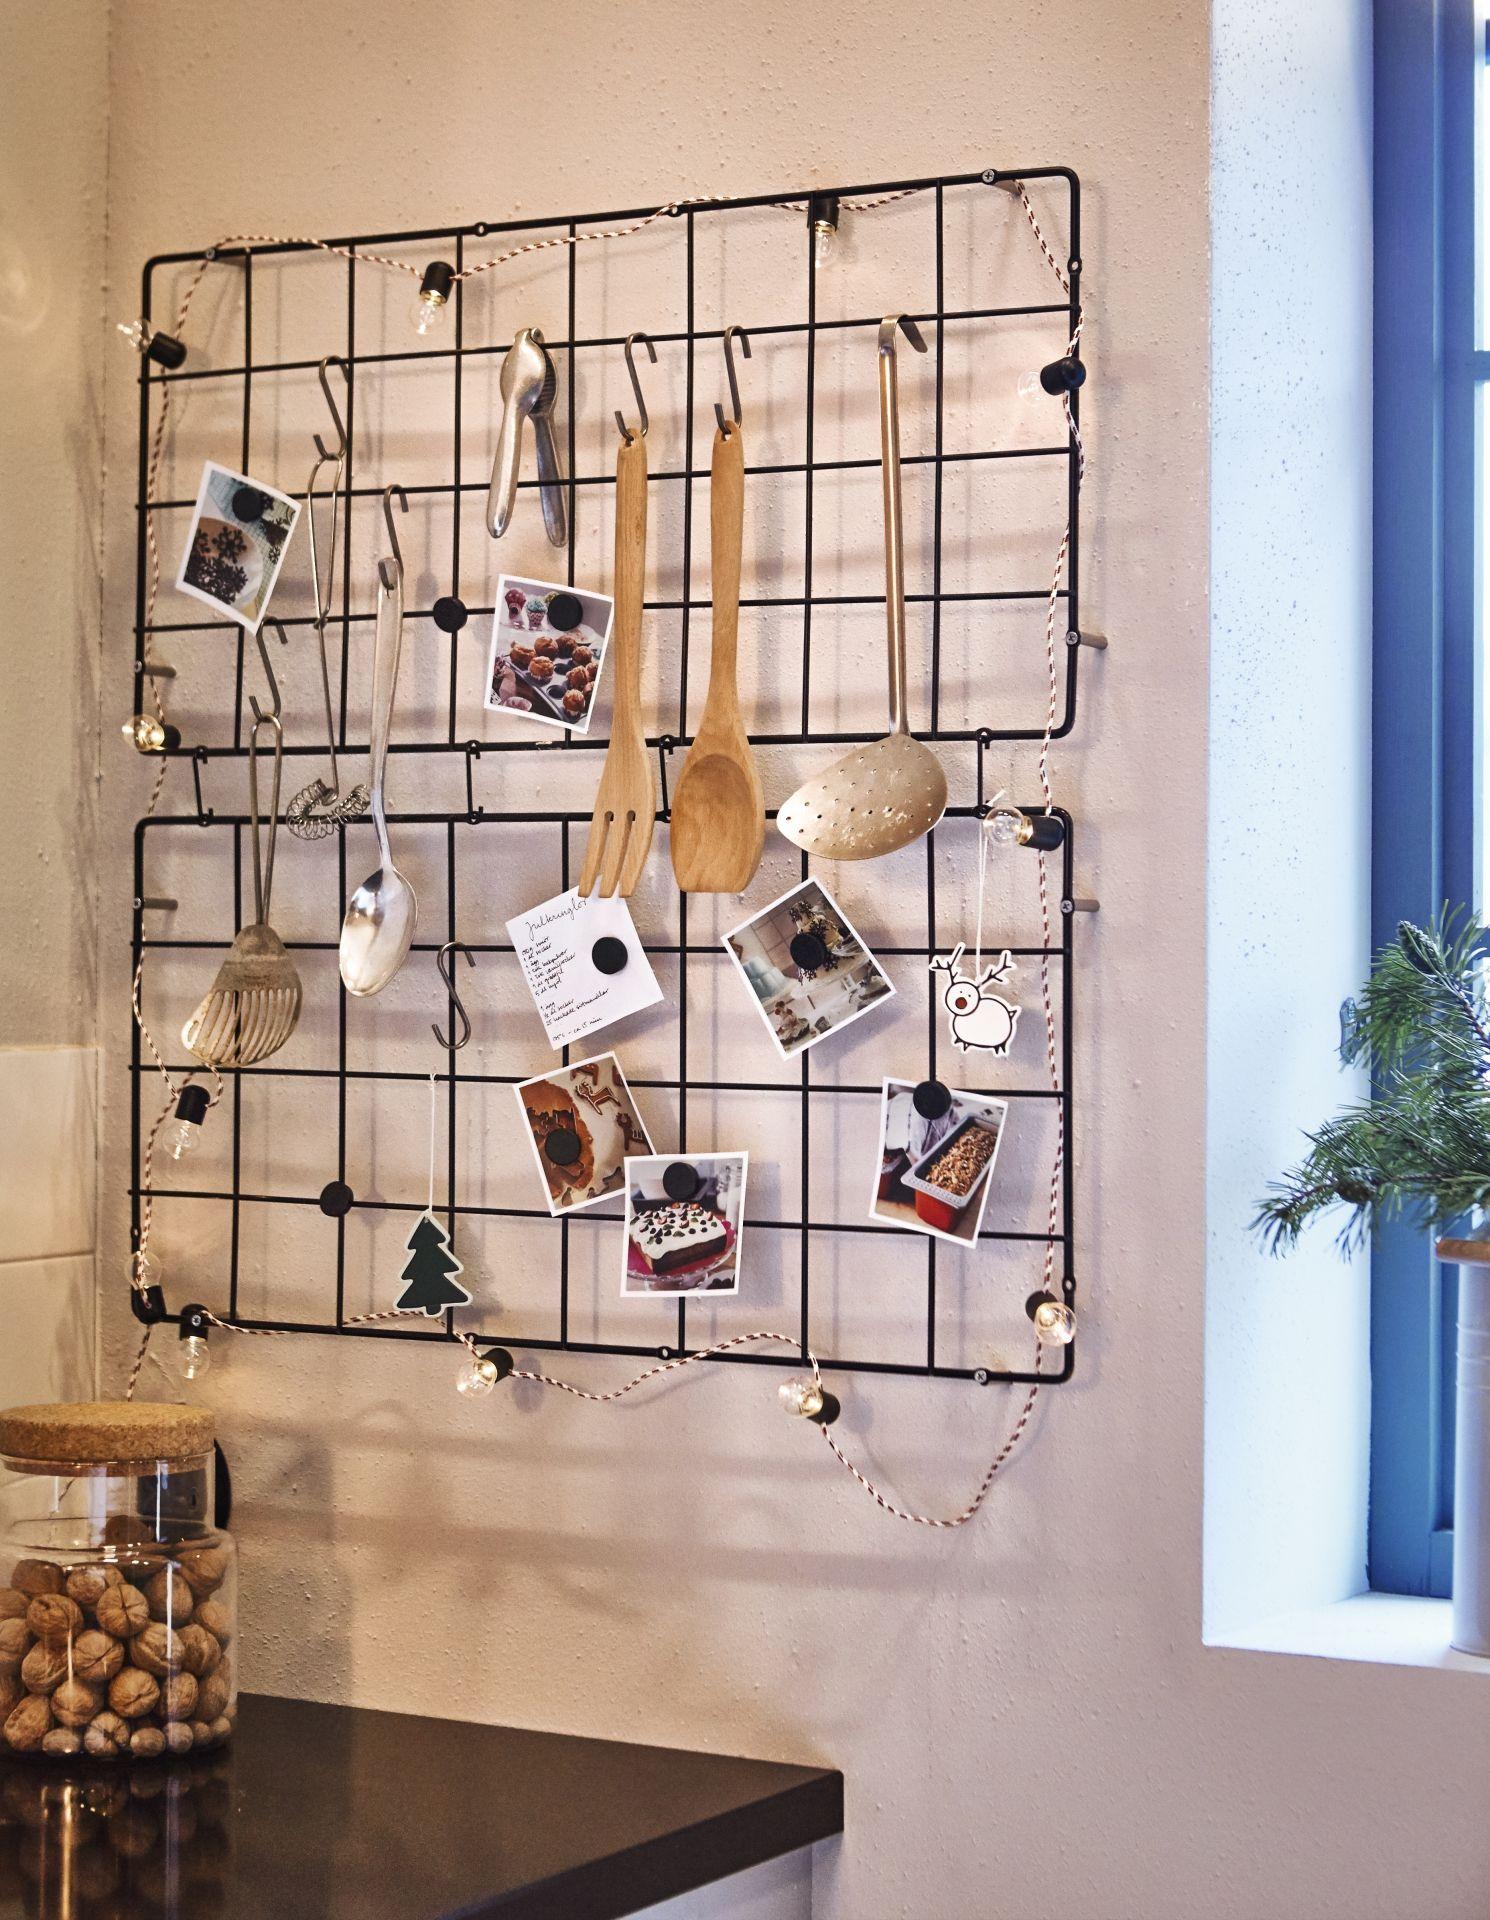 Barso Klimplantrek Ikea Ikeanl Ikeanederland Accessoires Decoratie